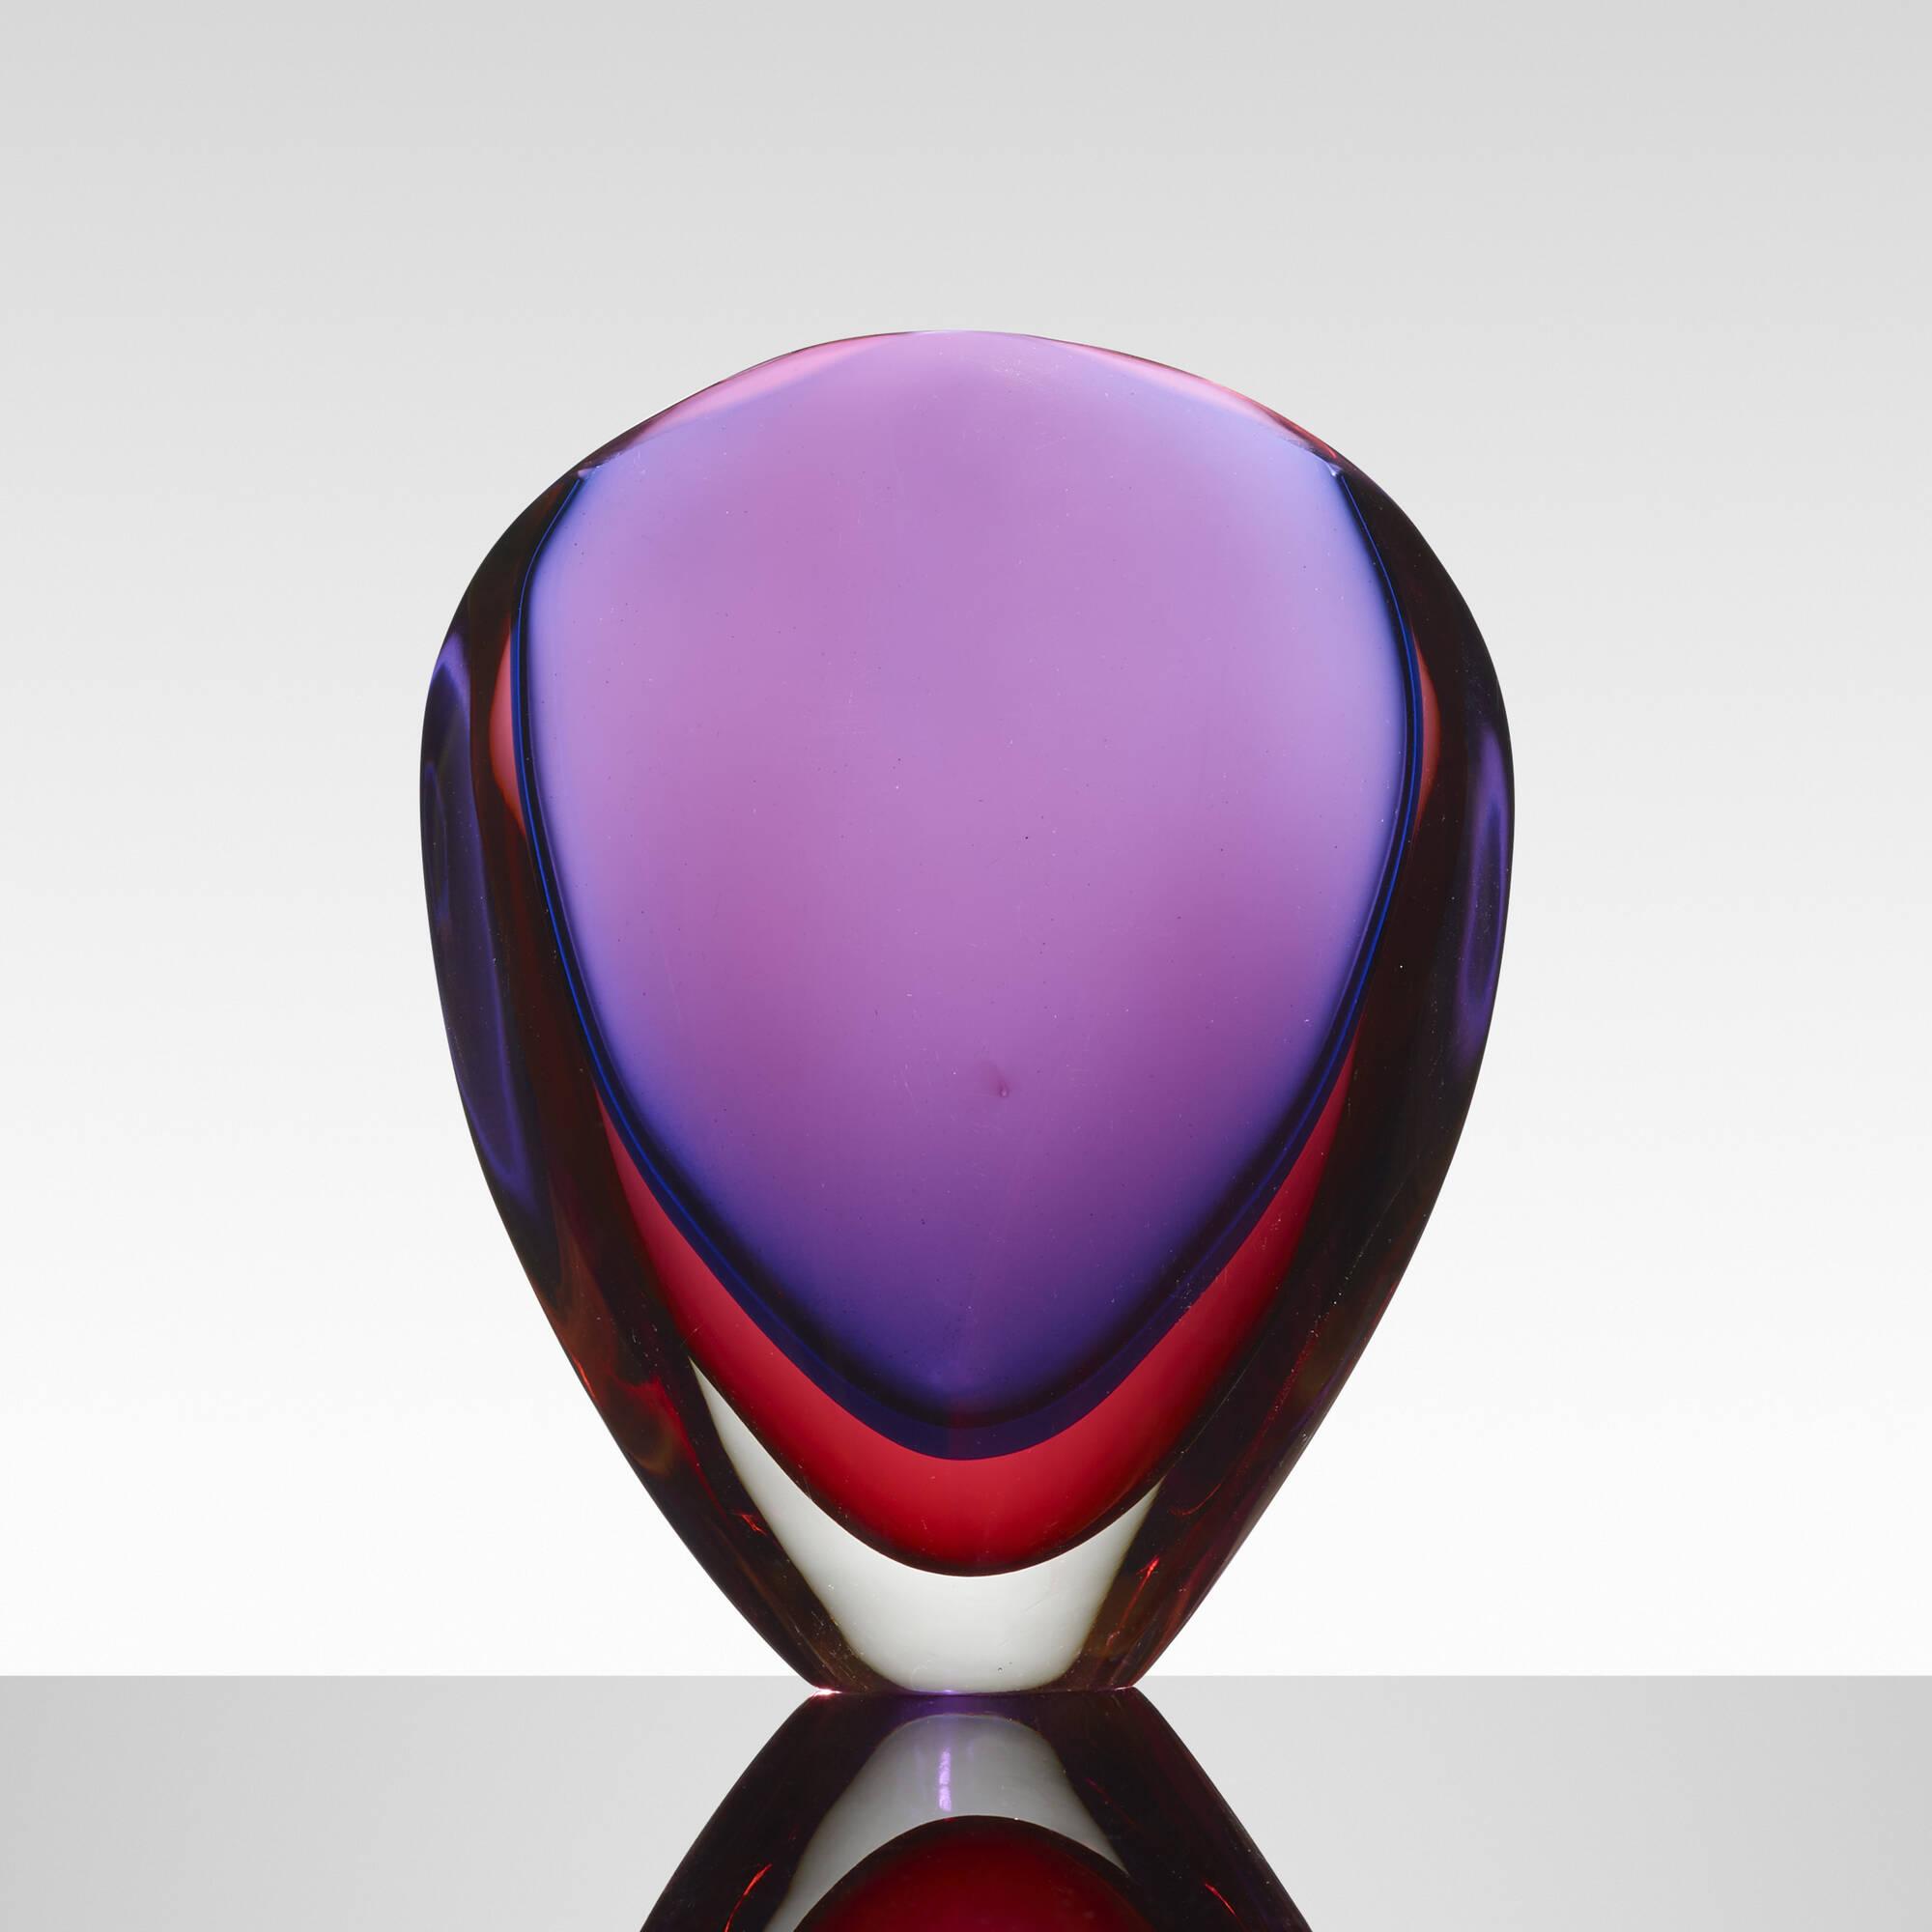 162: Flavio Poli / Valva vase, model 9814 (1 of 2)